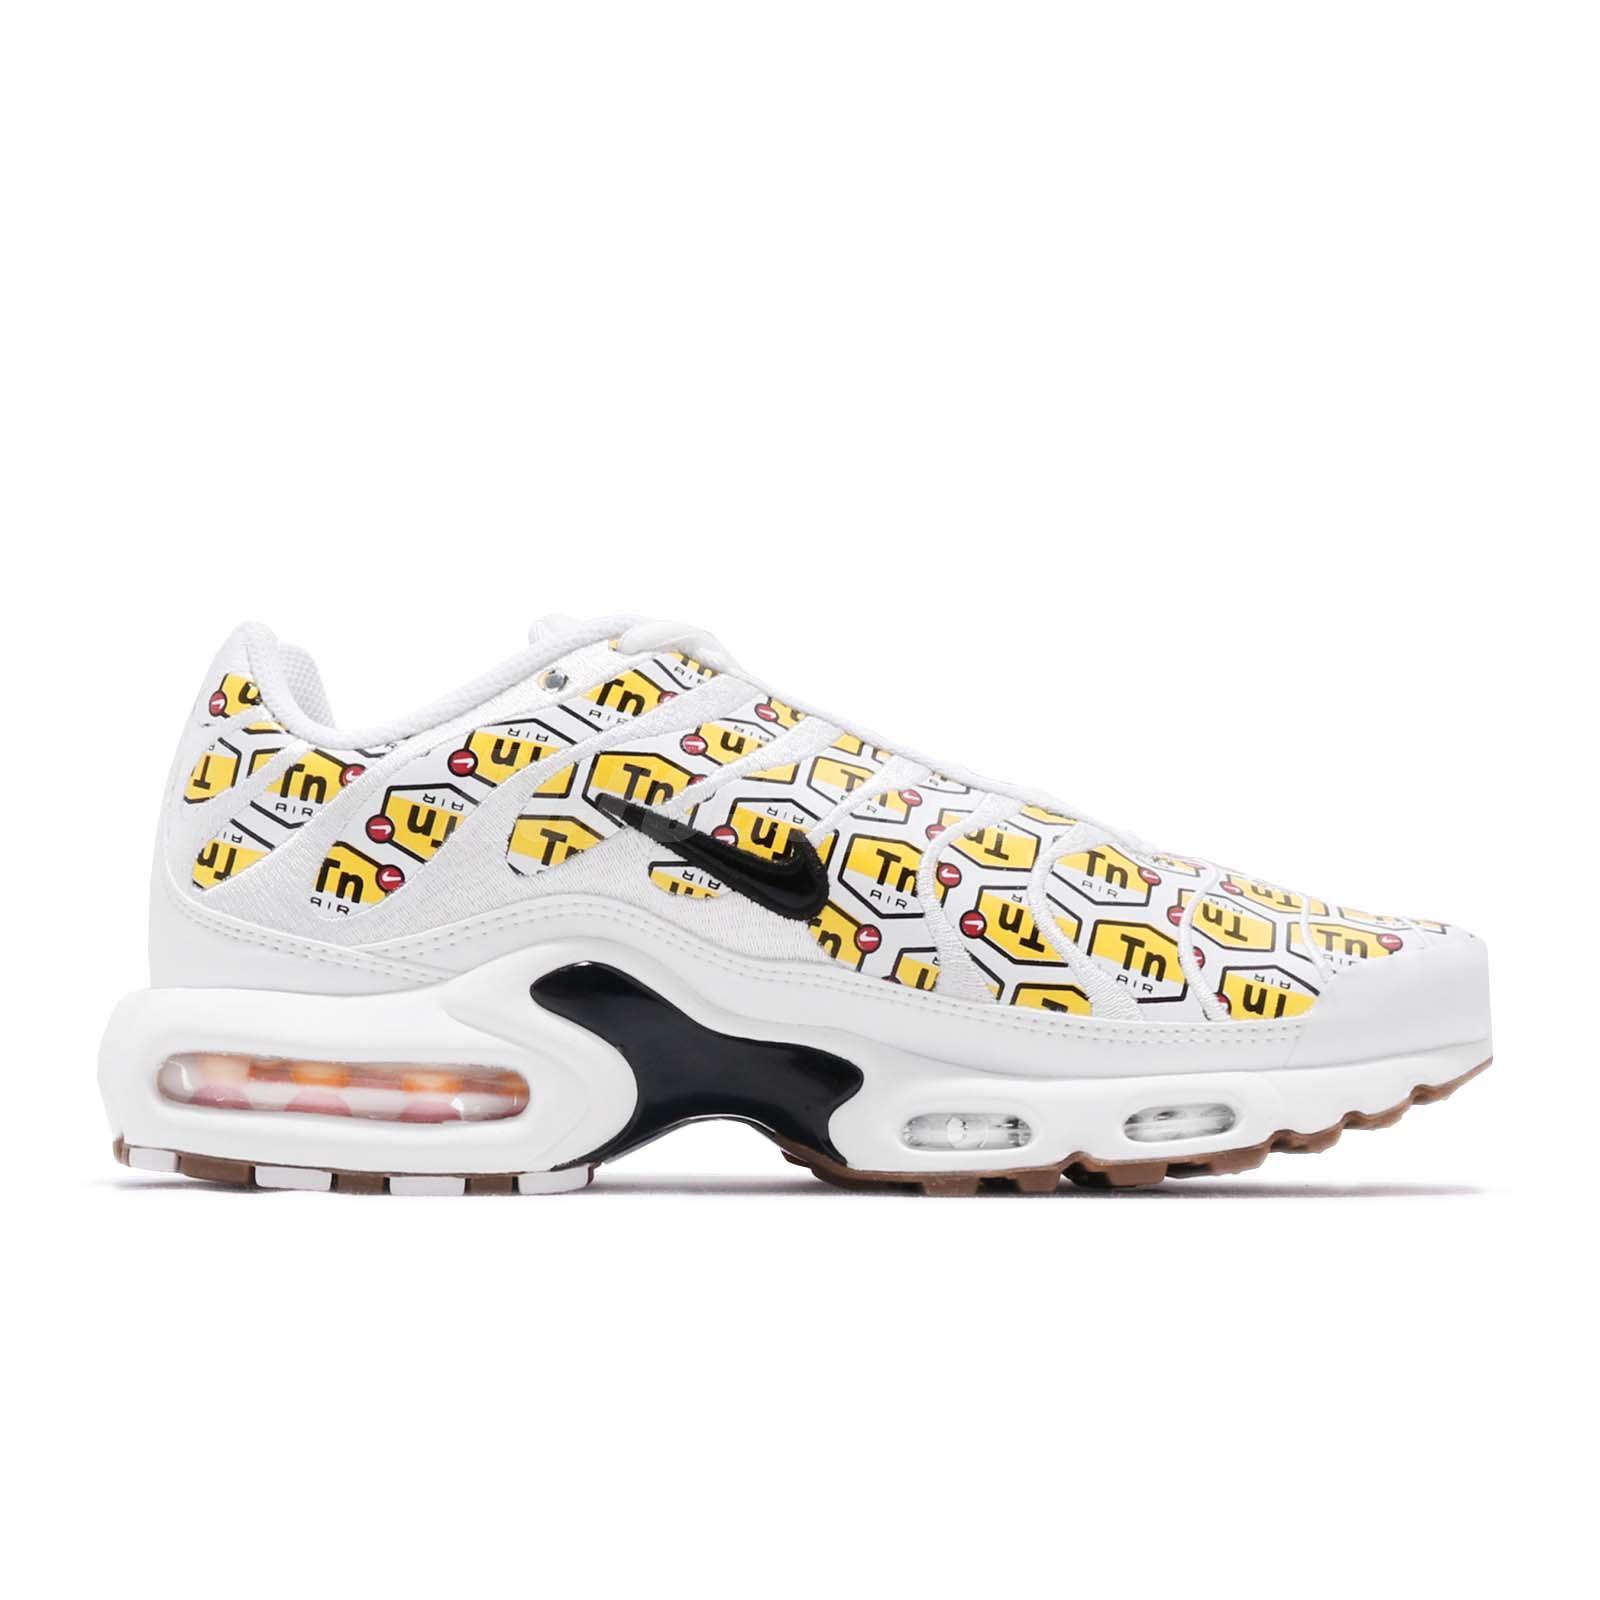 Nike Air Max Plus QS All Over Print White Black Yellow Gum Men Shoes ... b057c0d19